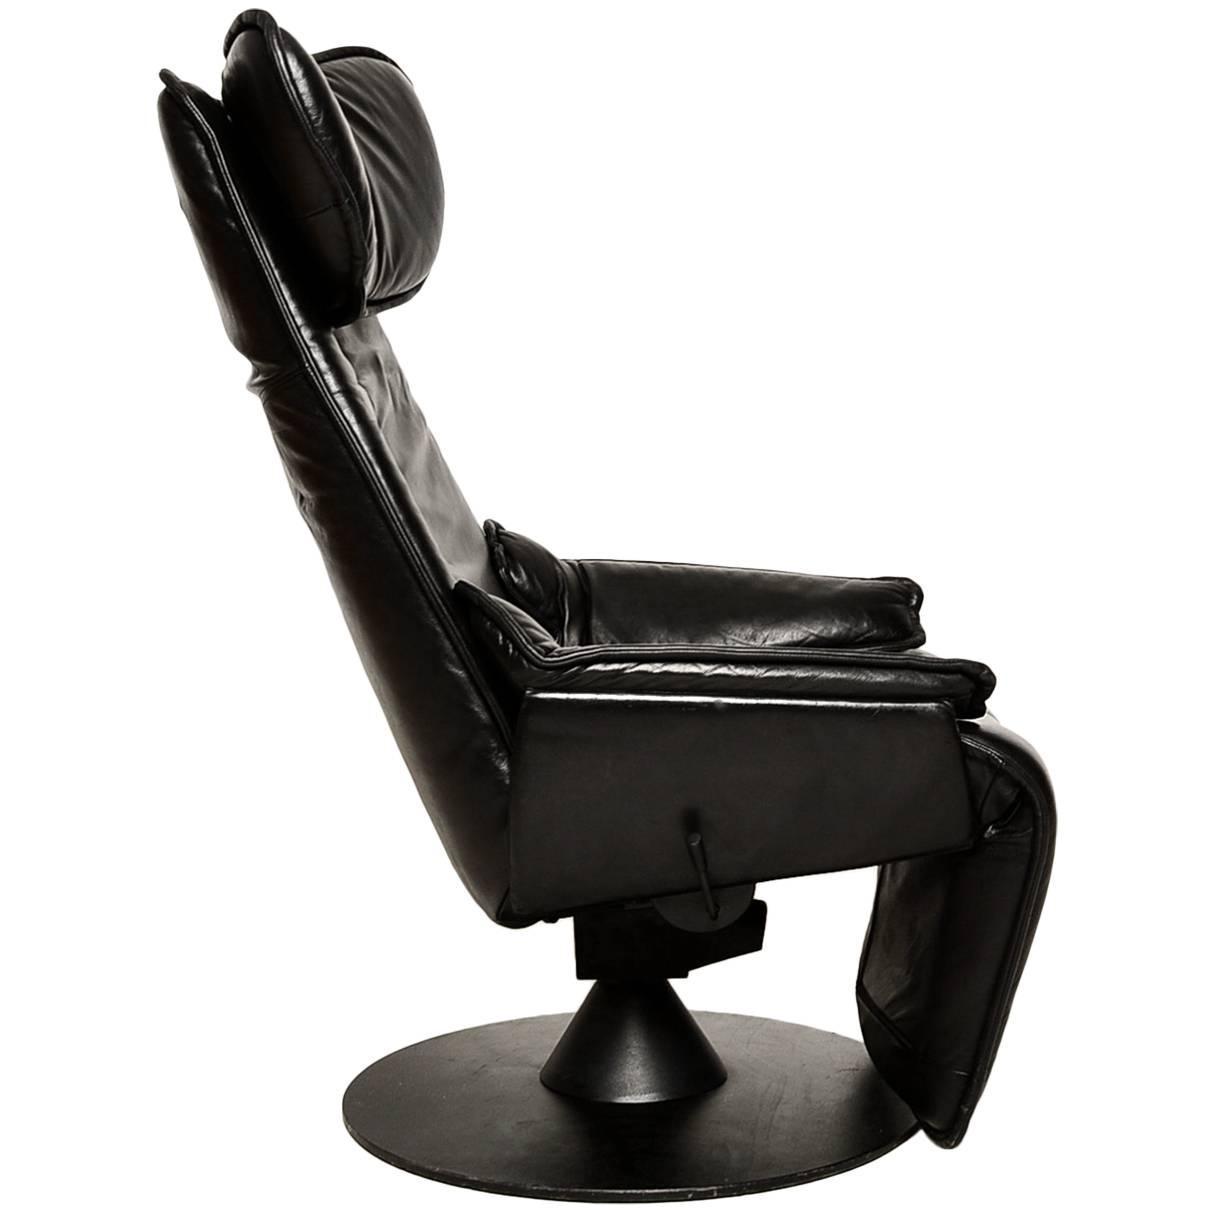 contura zero gravity recliner chair by modi hjellegjerde. Black Bedroom Furniture Sets. Home Design Ideas